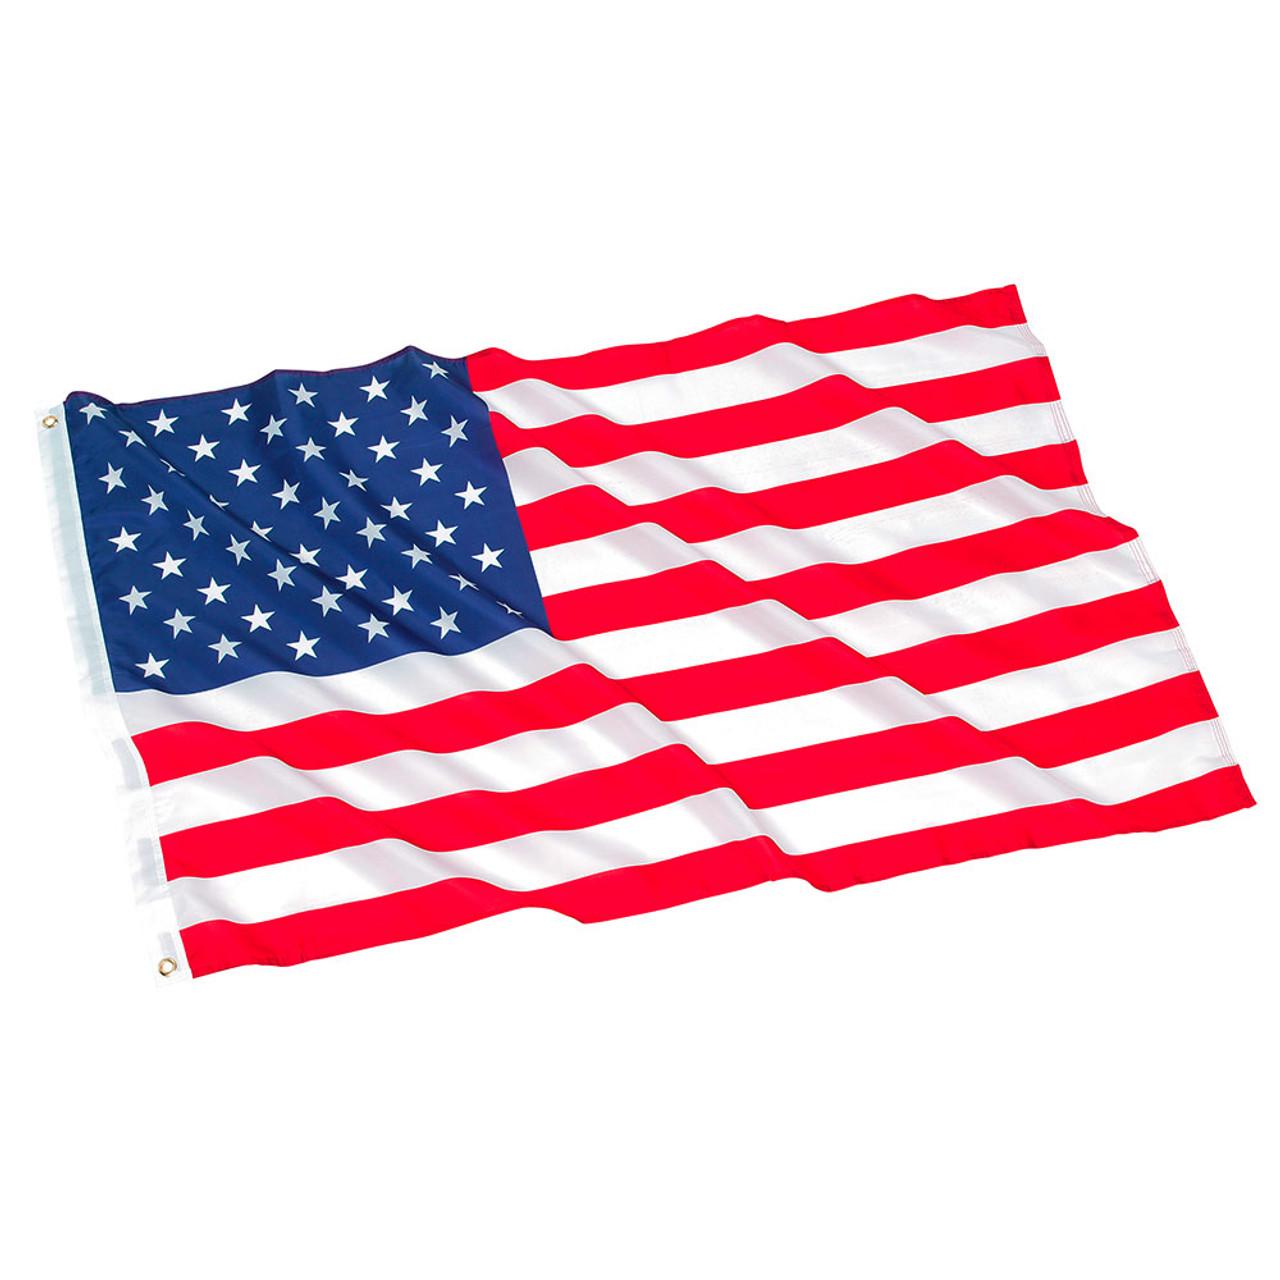 5' x 3' American Flag